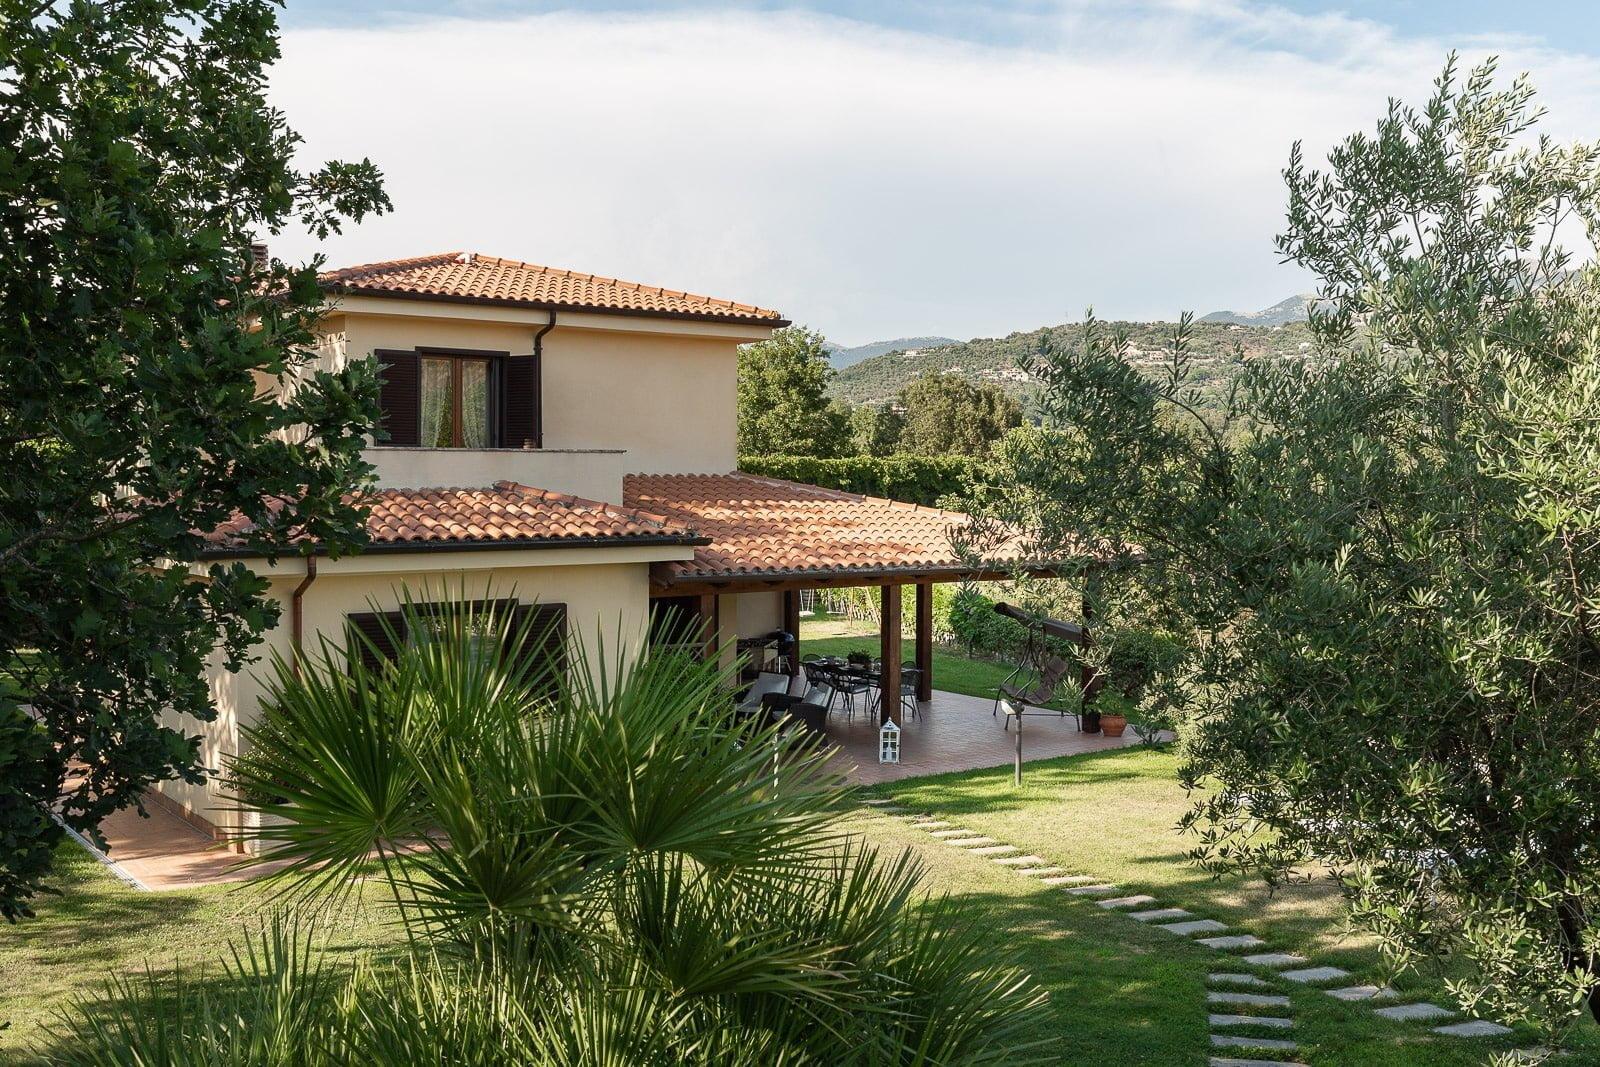 Villa Cita immersa nel verde